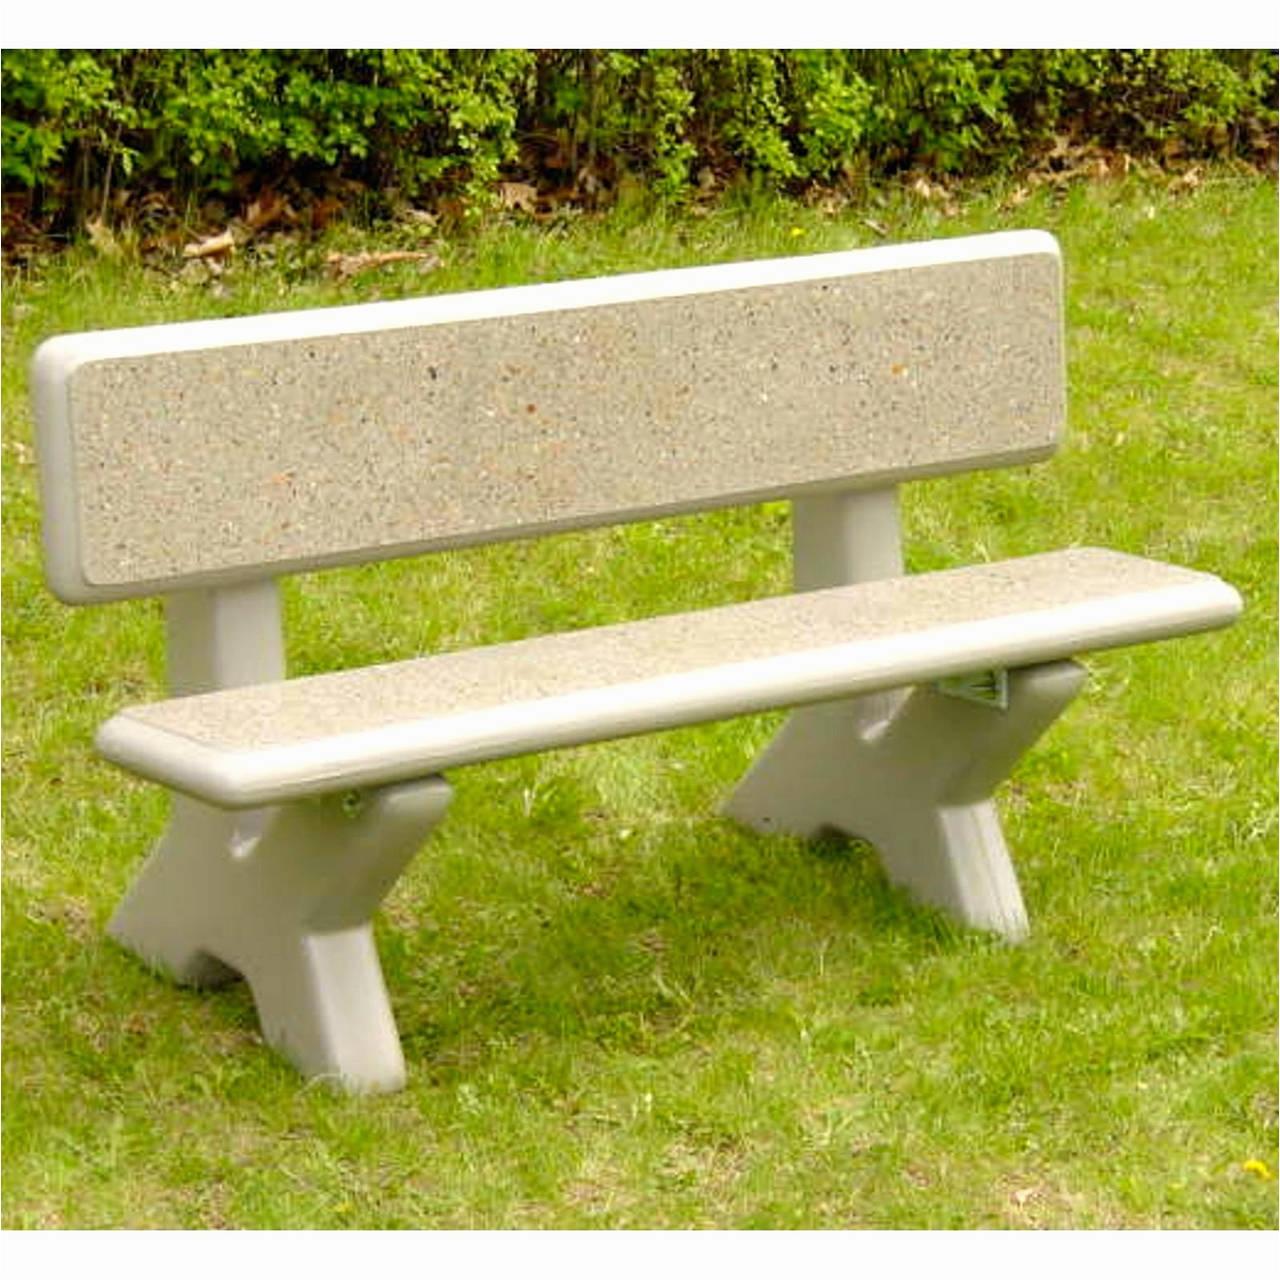 diy park bench elegant lowes patio bench oxobee